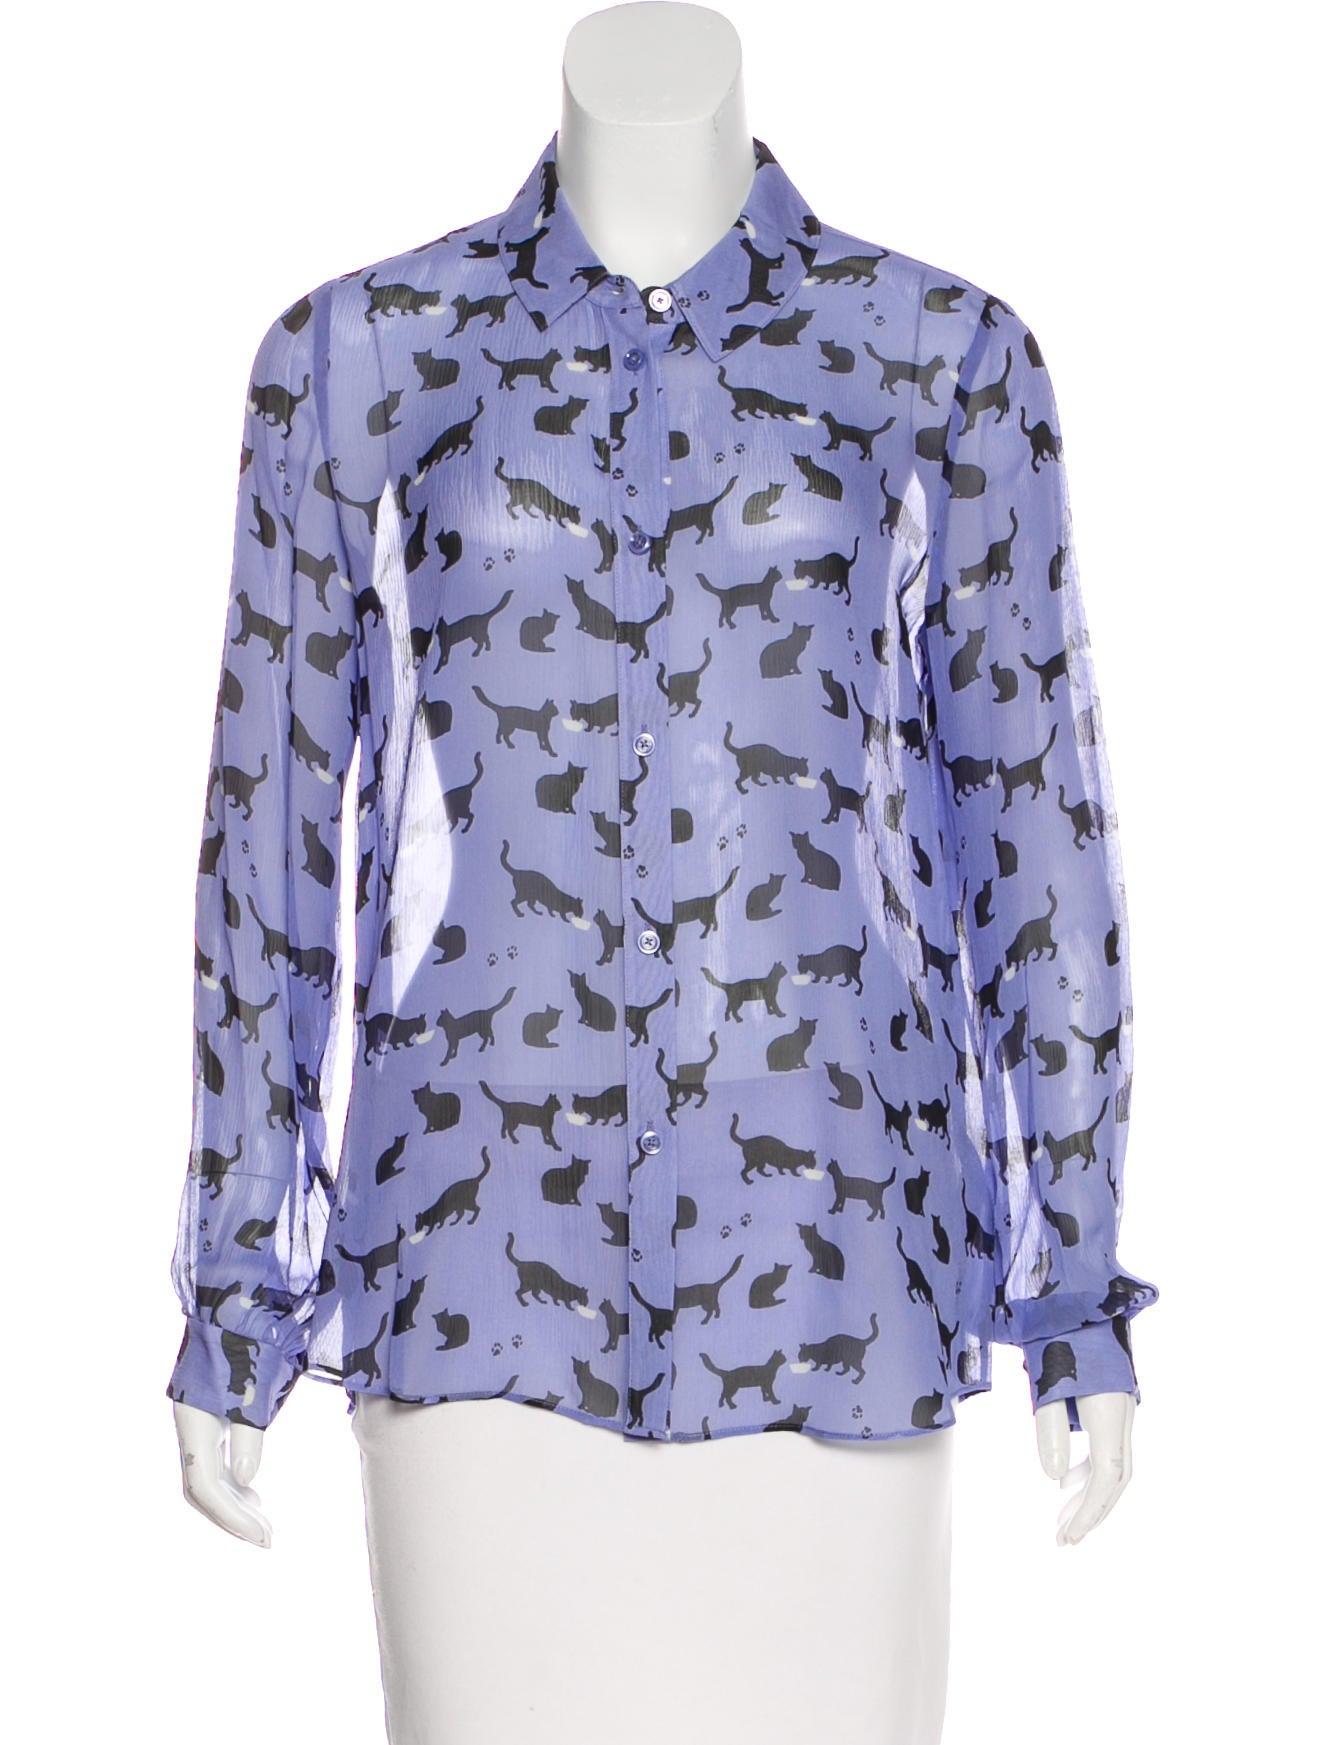 431aabb3 Periwinkle Blue Silk Blouse | Toffee Art